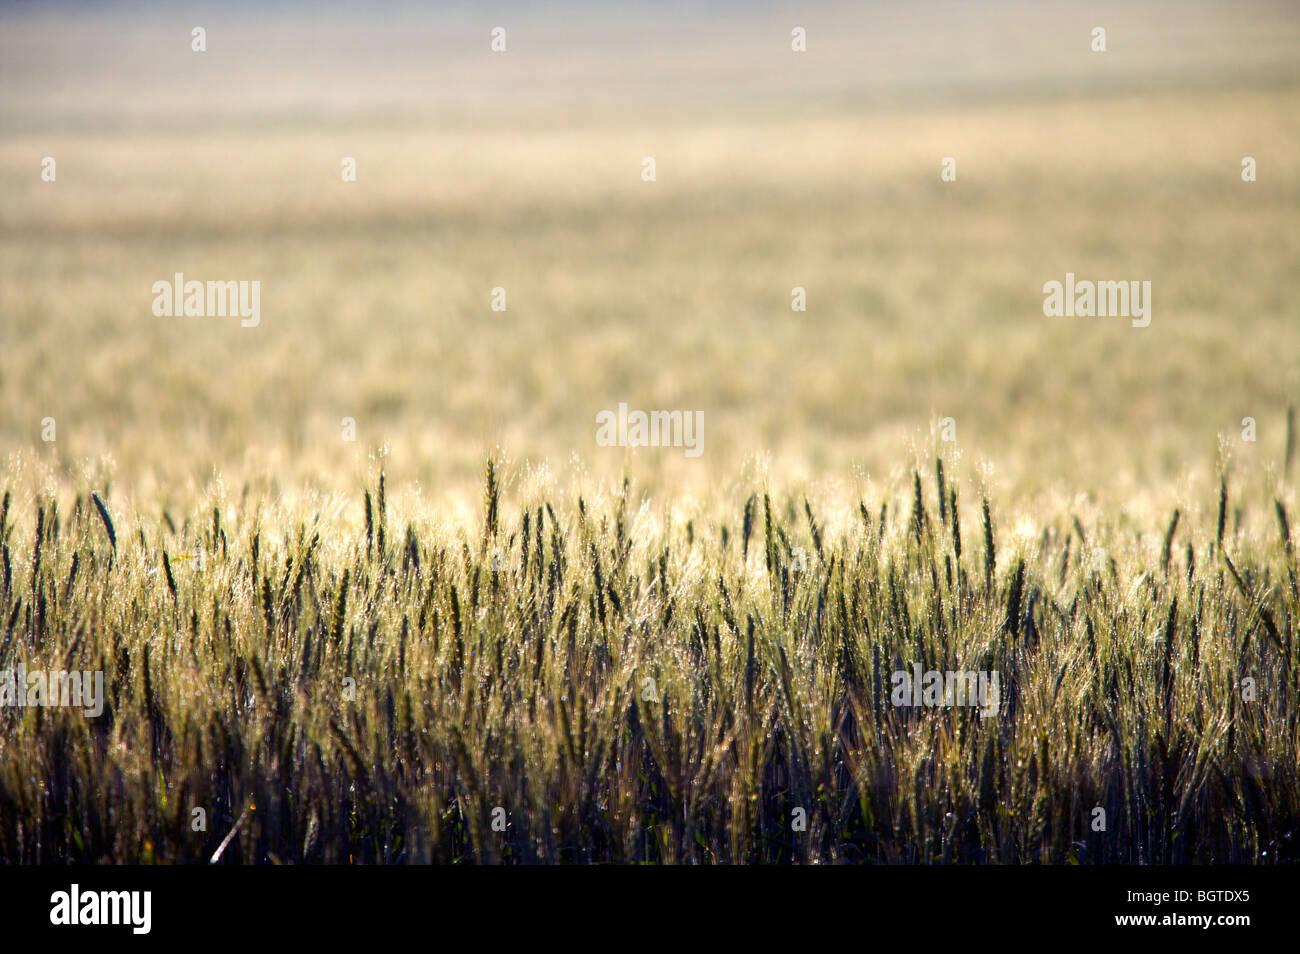 Kreative Ansicht von Weizen Feld, Overberg, Western Cape, Südafrika Stockbild